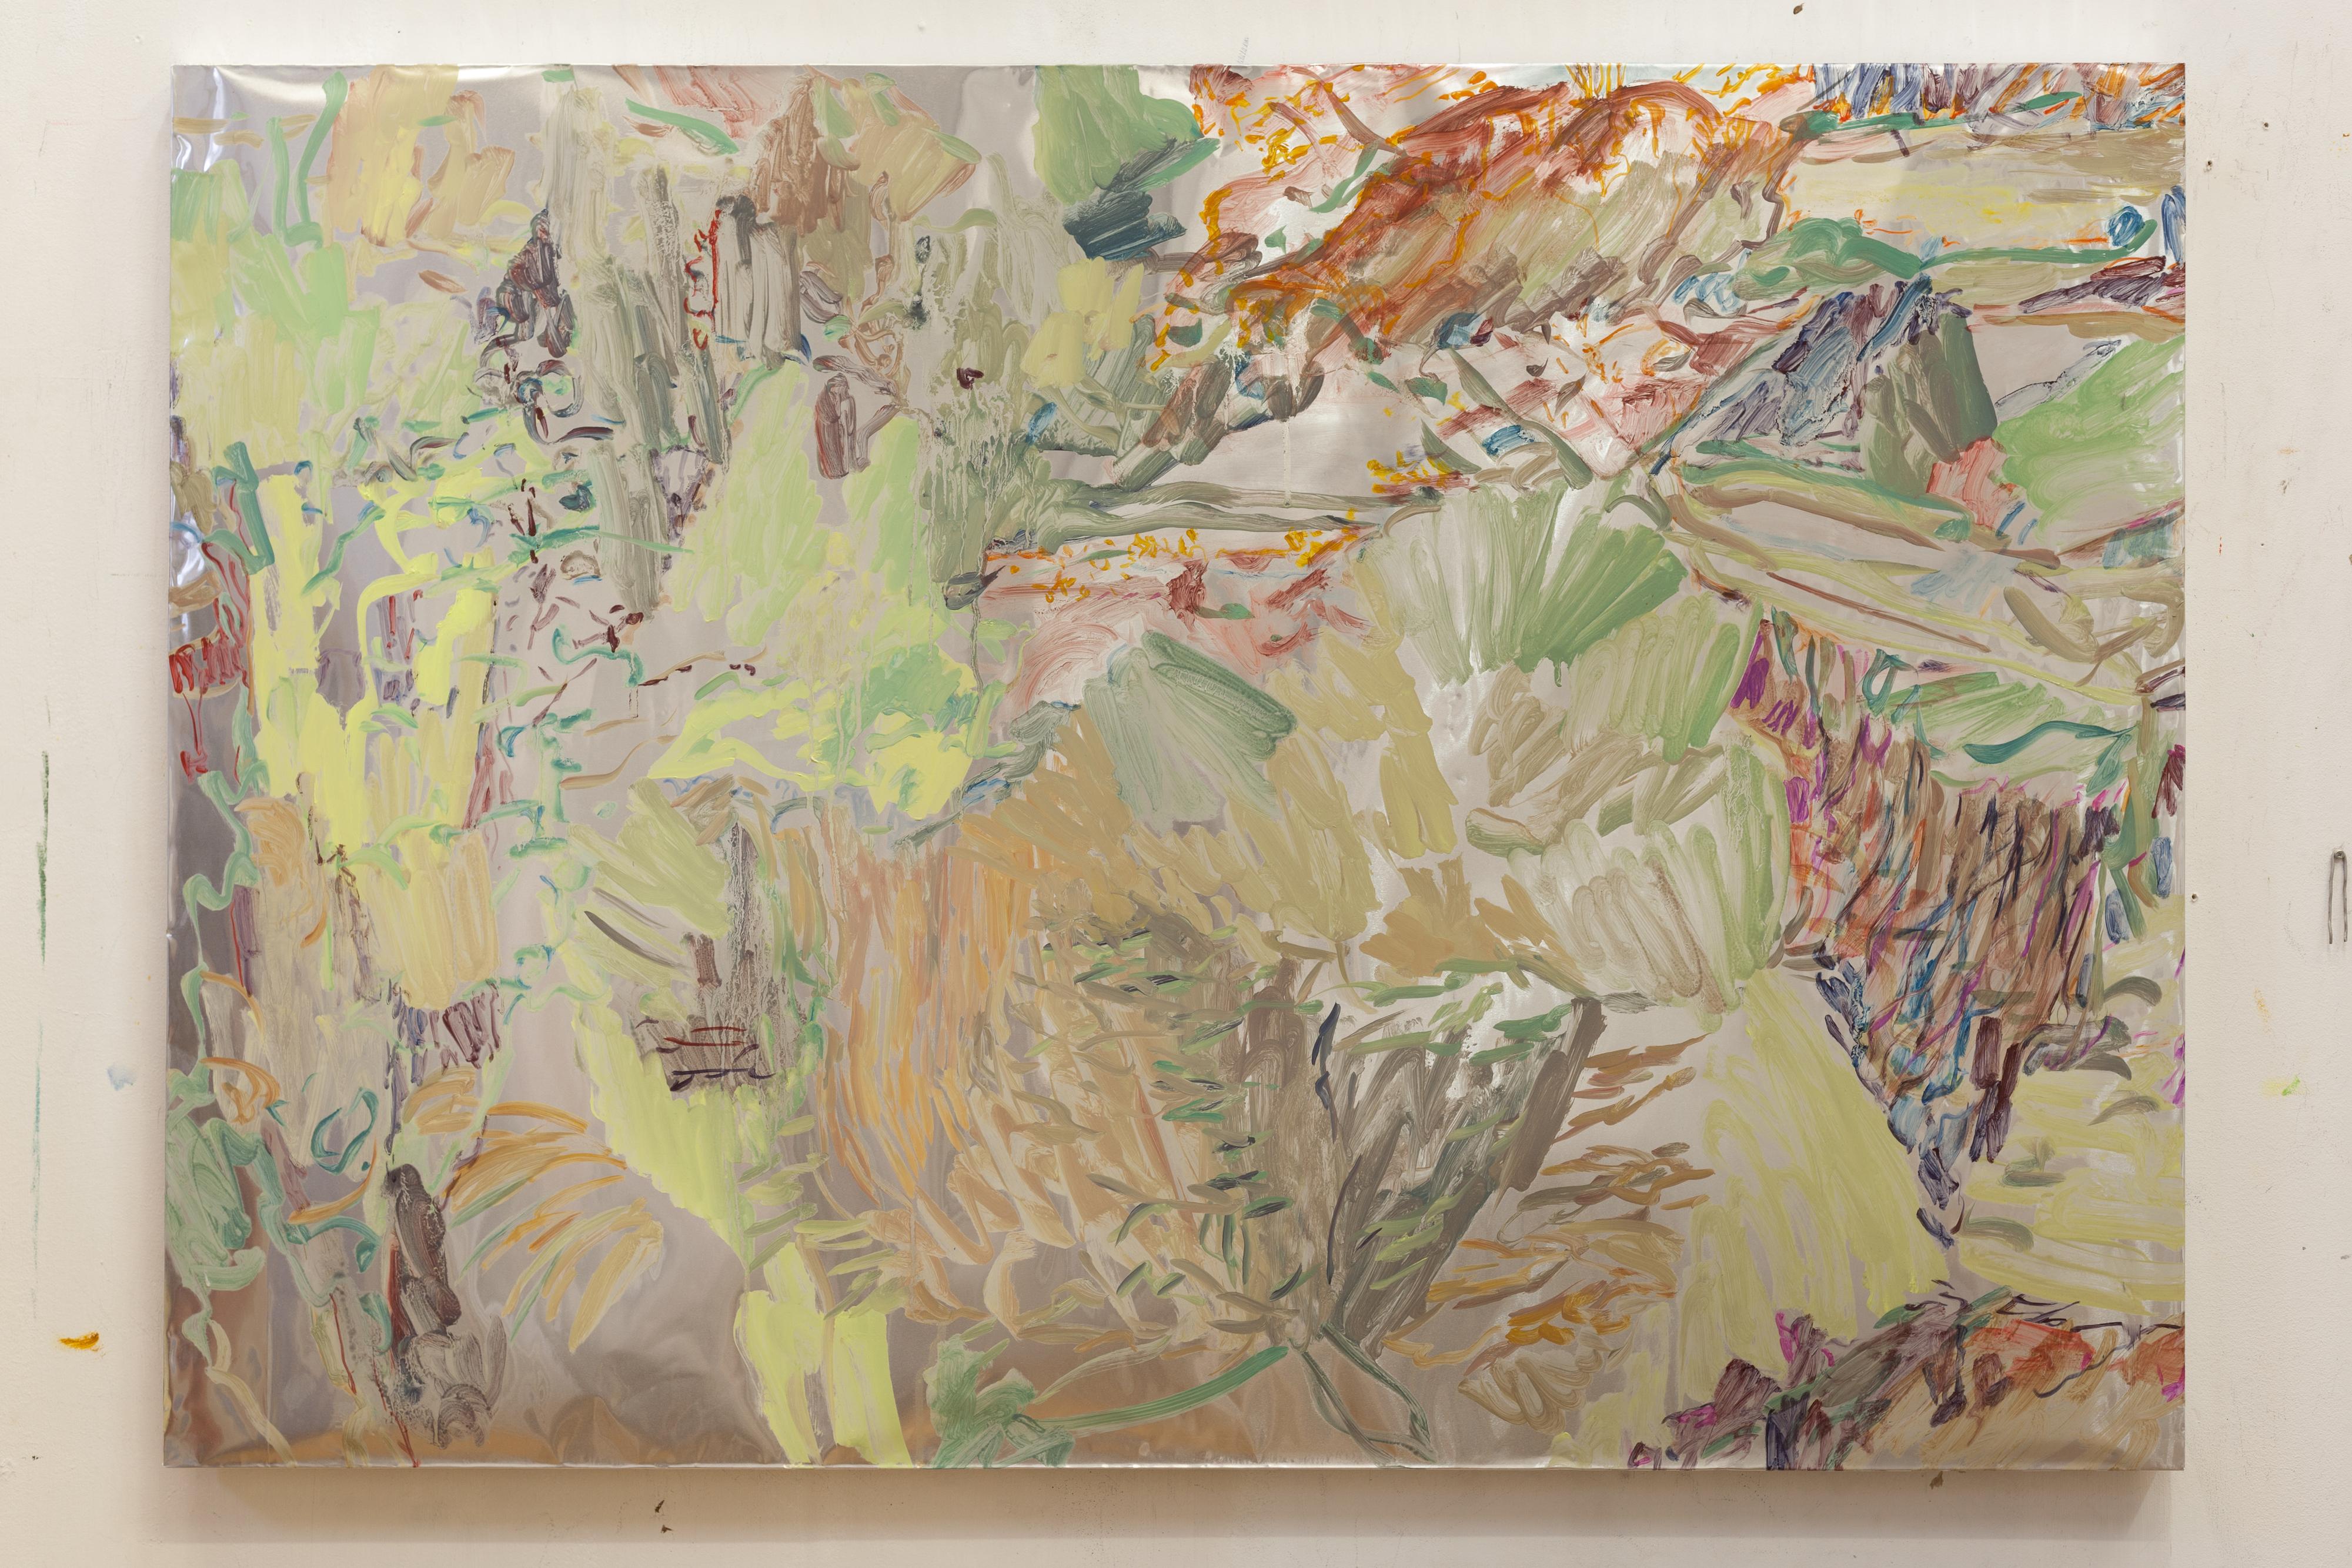 Henrik Eriksson, Utan titel (dhs x), 2018 Oil on aluminium, 85 x 122 cm